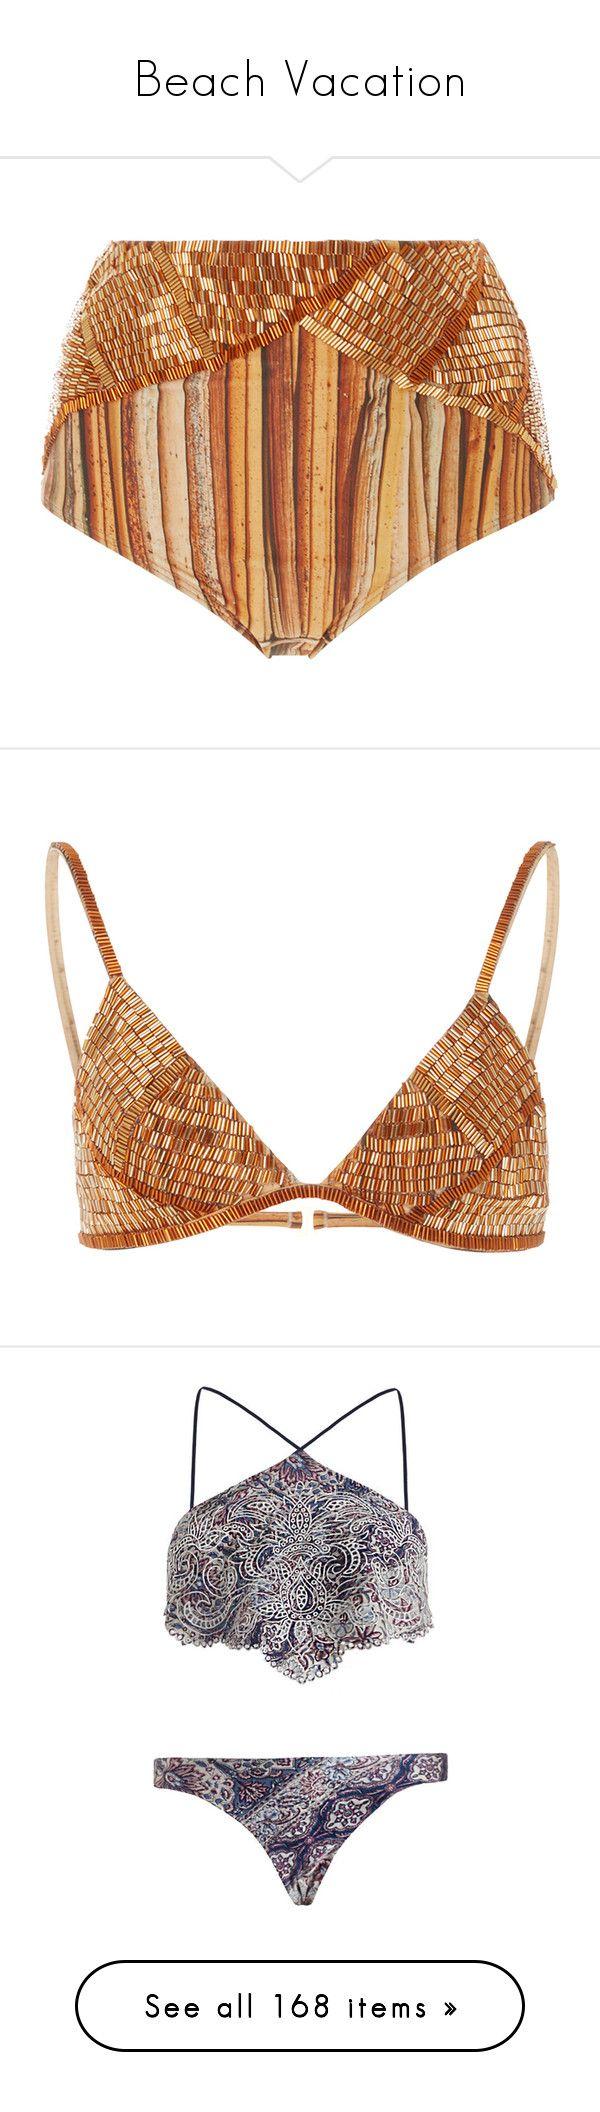 """Beach Vacation"" by samnbuckley ❤ liked on Polyvore featuring swimwear, bikinis, bikini bottoms, gold, striped high waisted bikini, swim bikini bottoms, high rise bikini, high-waisted bikinis, beaded bikini and bikini tops"